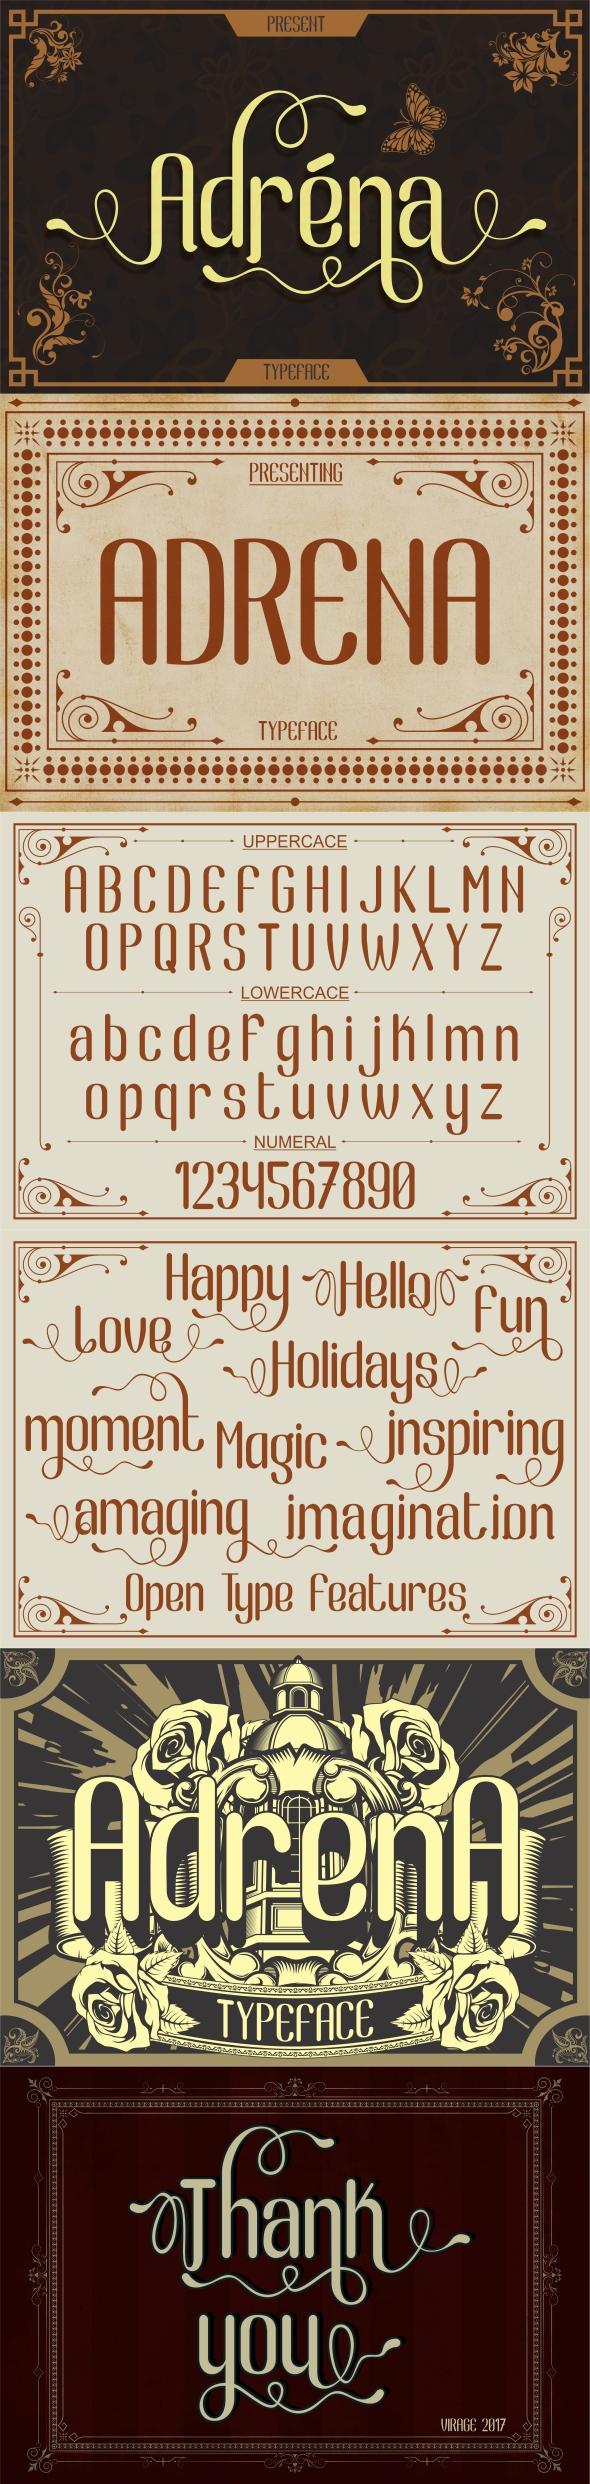 Adrena typeface - Stencil & Type Decorative